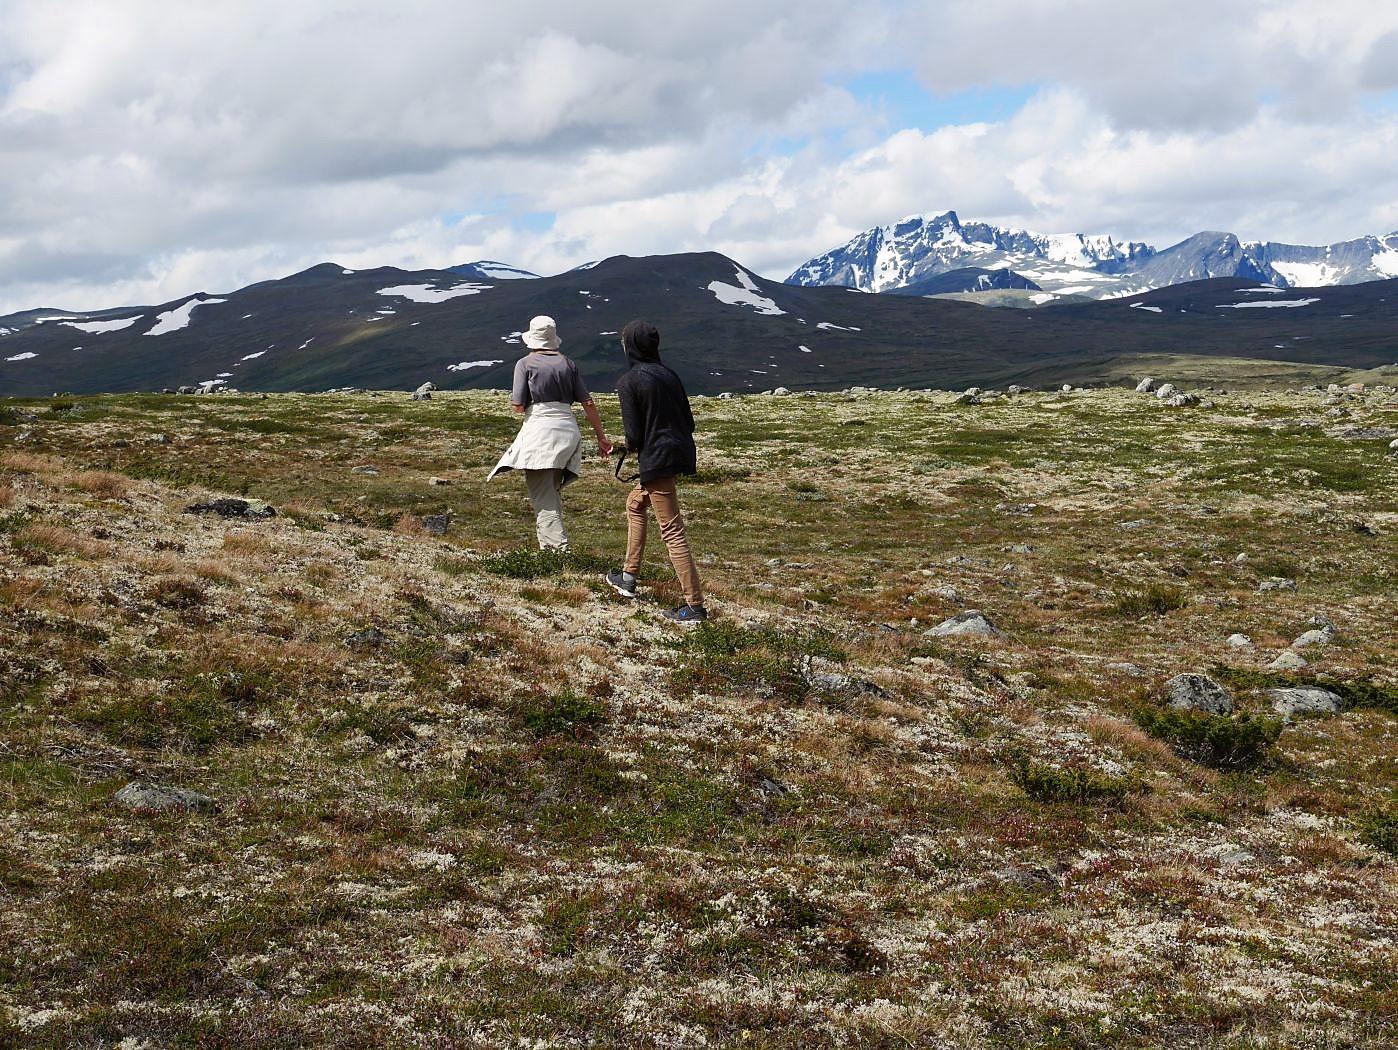 Weglos durchs Fjell mit tollem Panorama